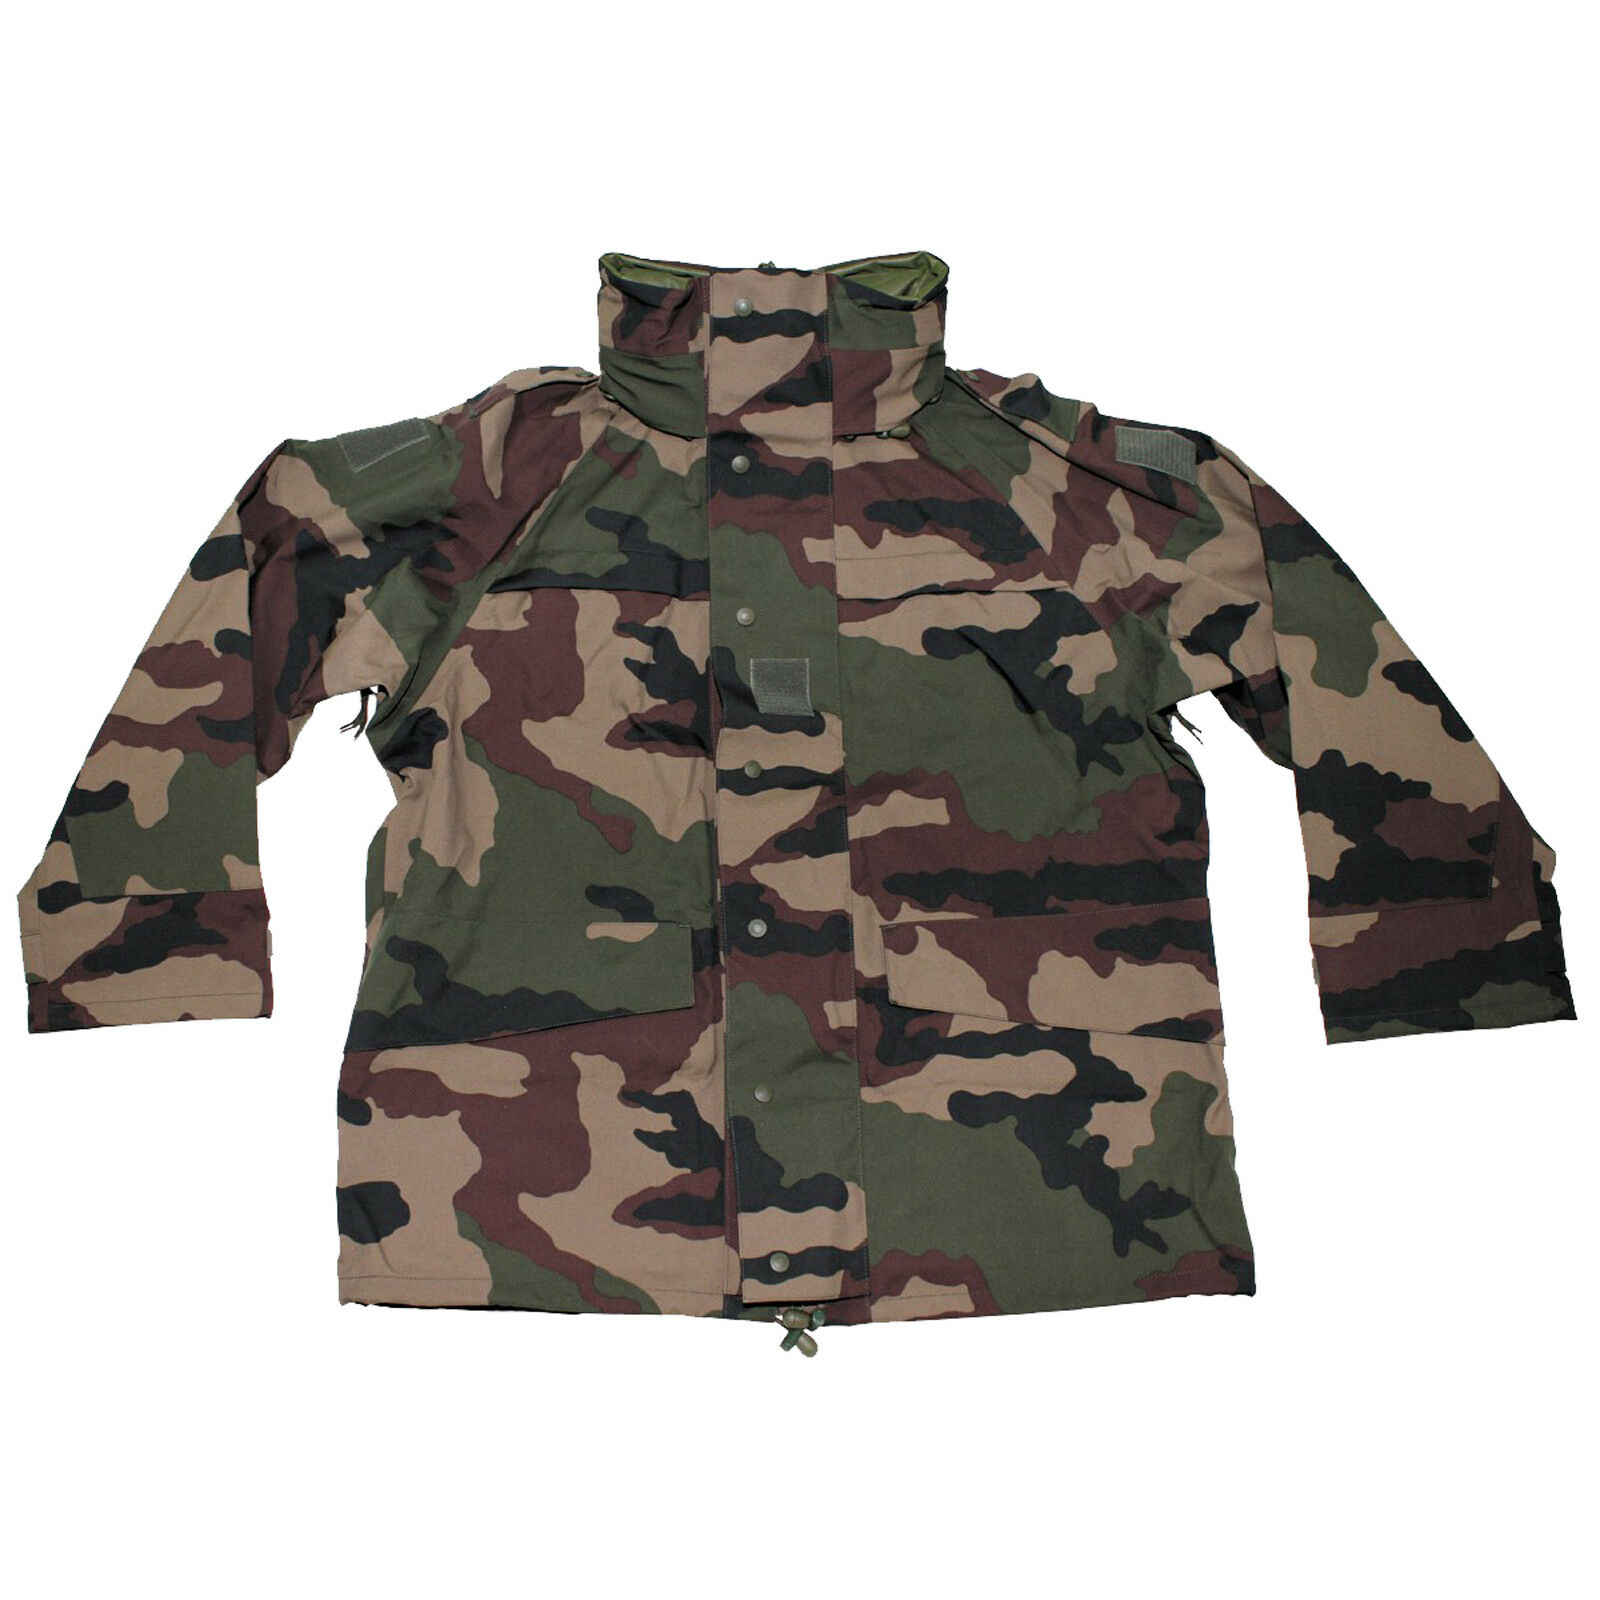 Genuino problema del ejército Francés CCE Camuflaje Gore-Tex Impermeable  Chaqueta De Lluvia  el mas reciente